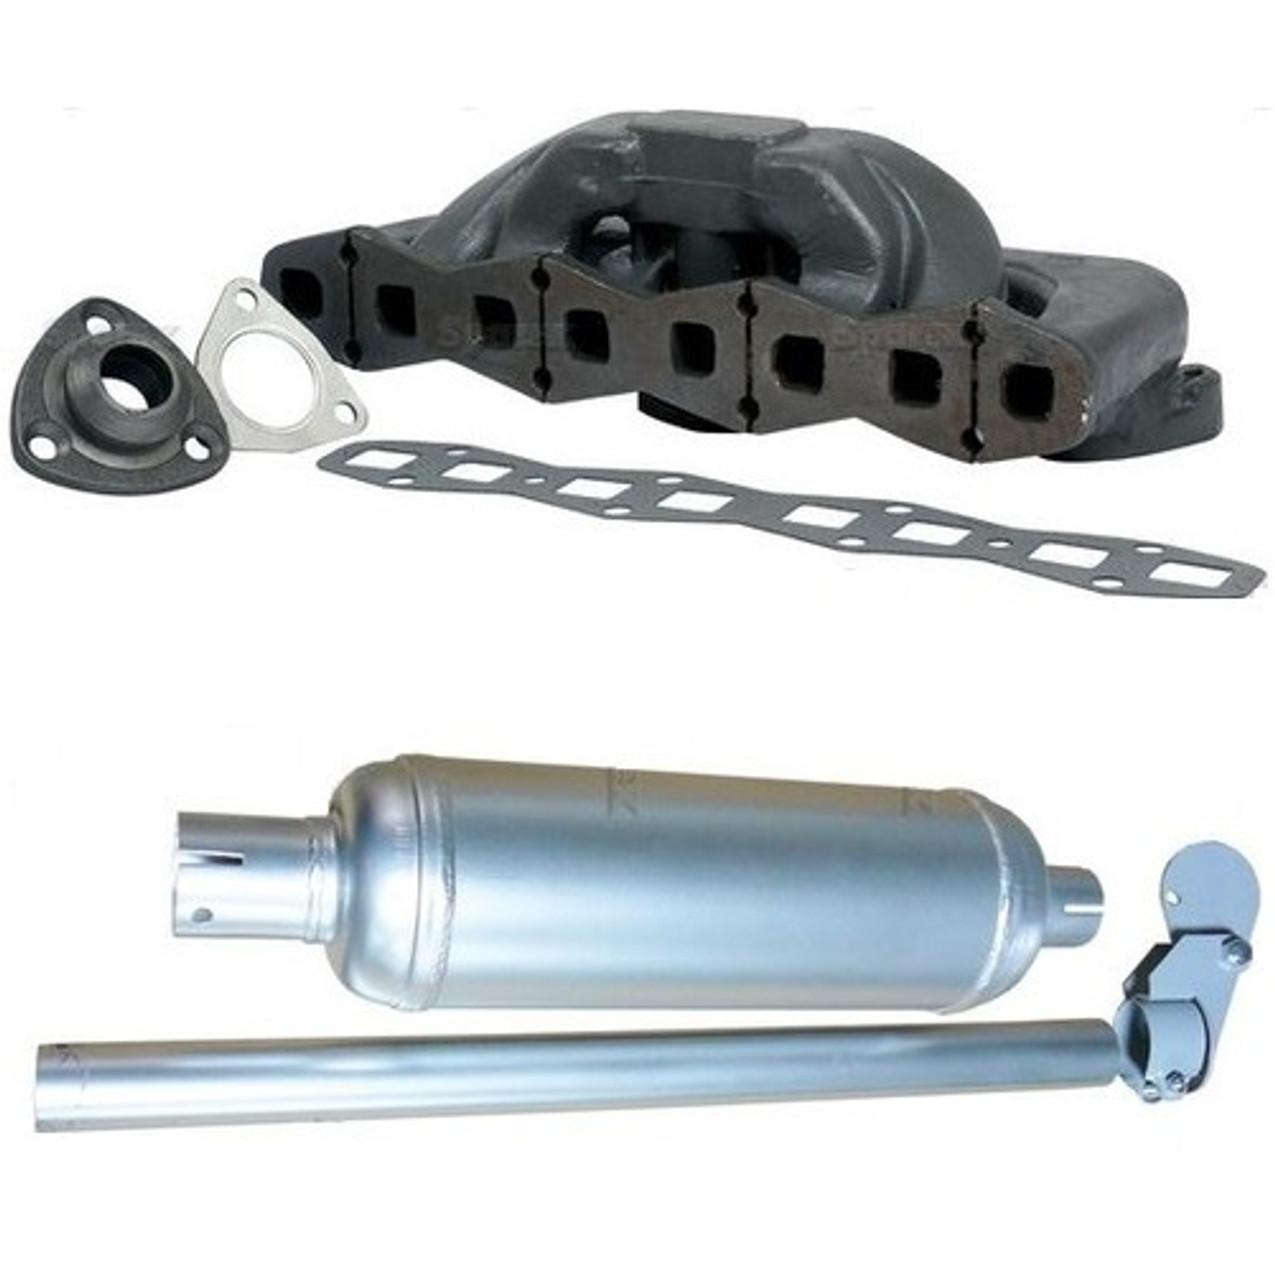 Exhaust Manifold and Muffler